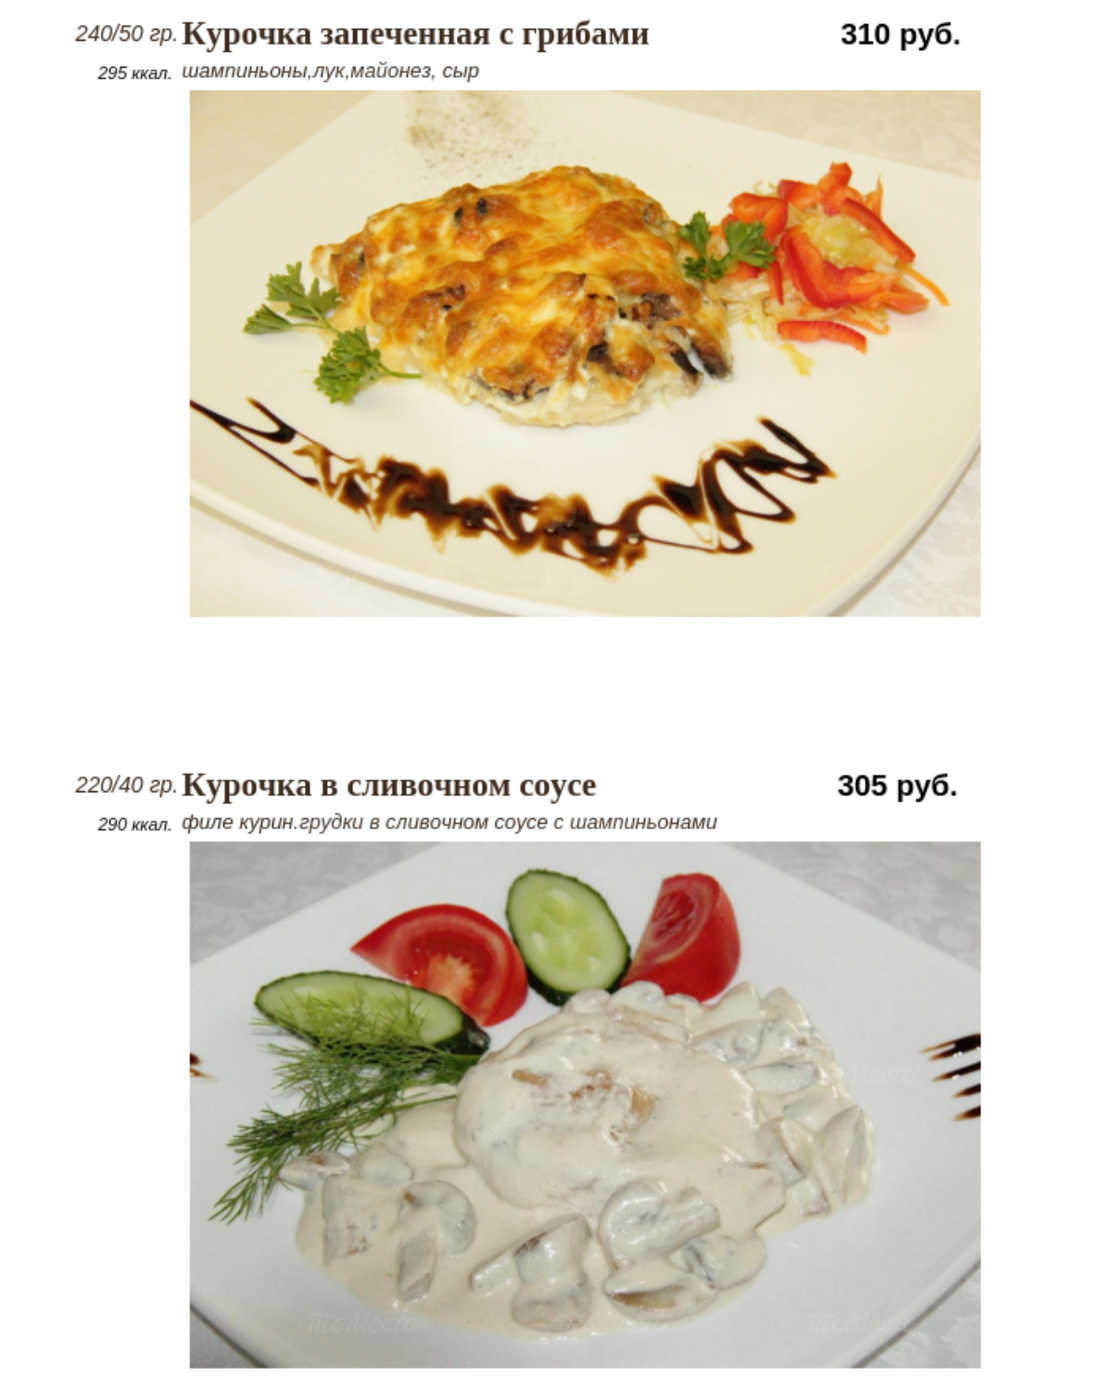 Меню бара, кафе Адмирал на улице Пархоменко